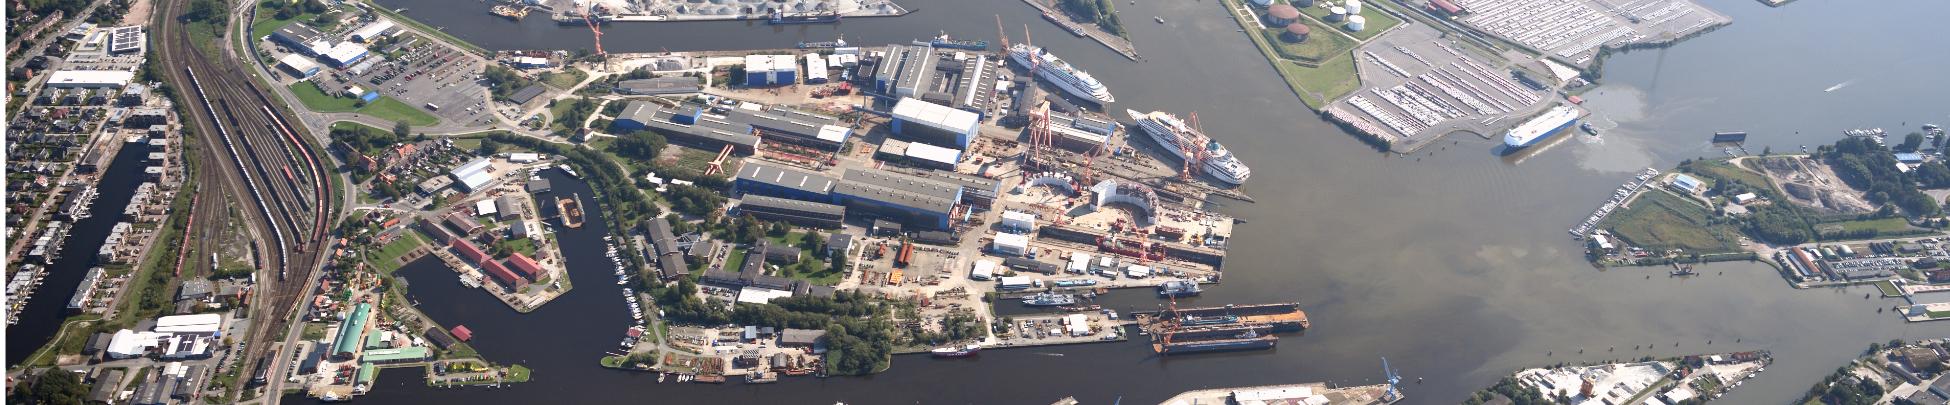 https://www.seaports.de/content/uploads/Emden_Ansicht1_innerer-Hafen_banner.jpg